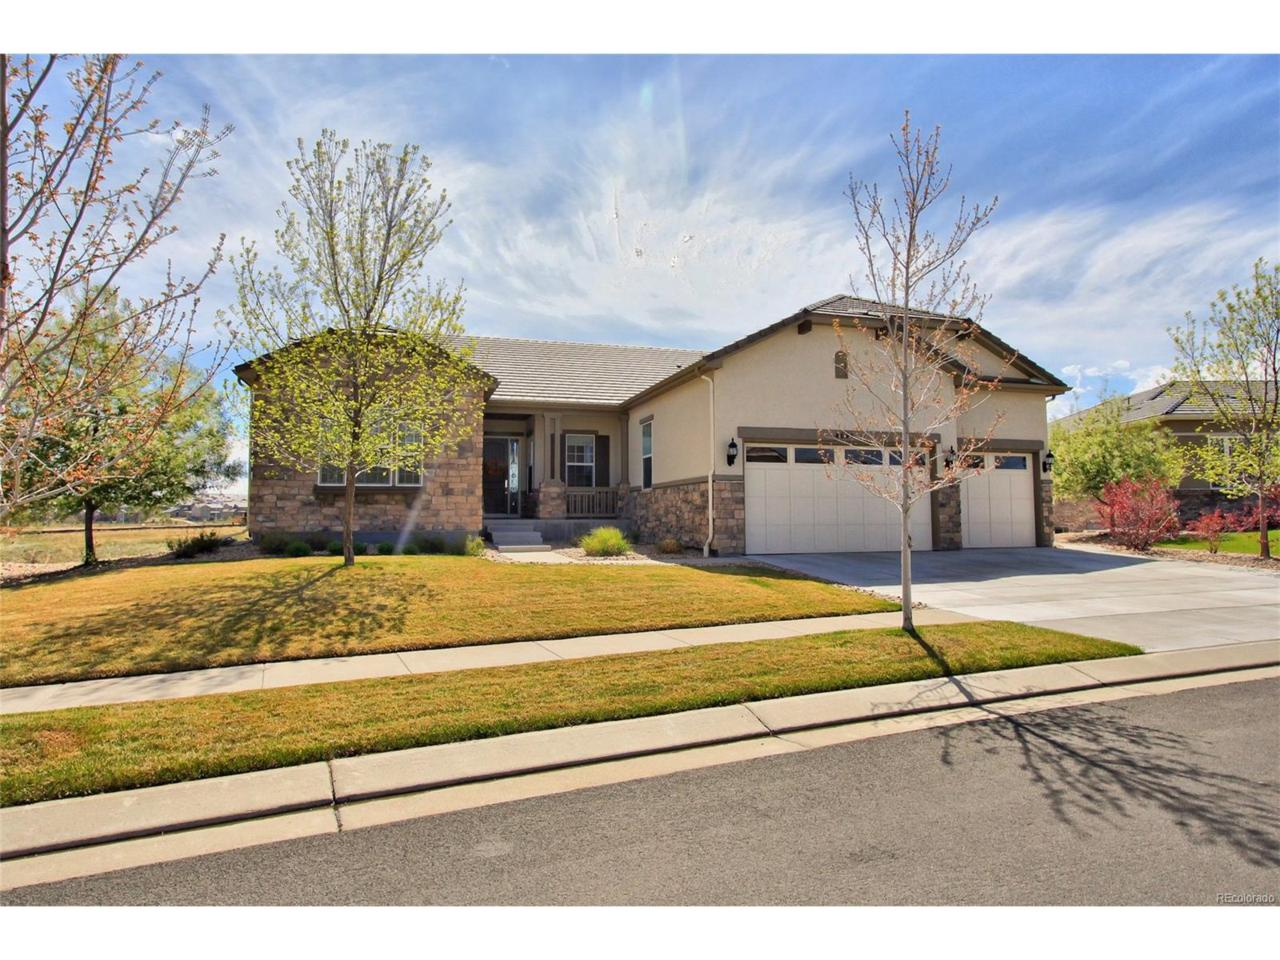 4644 Belford Circle, Broomfield, CO 80023 (MLS #6717489) :: 8z Real Estate